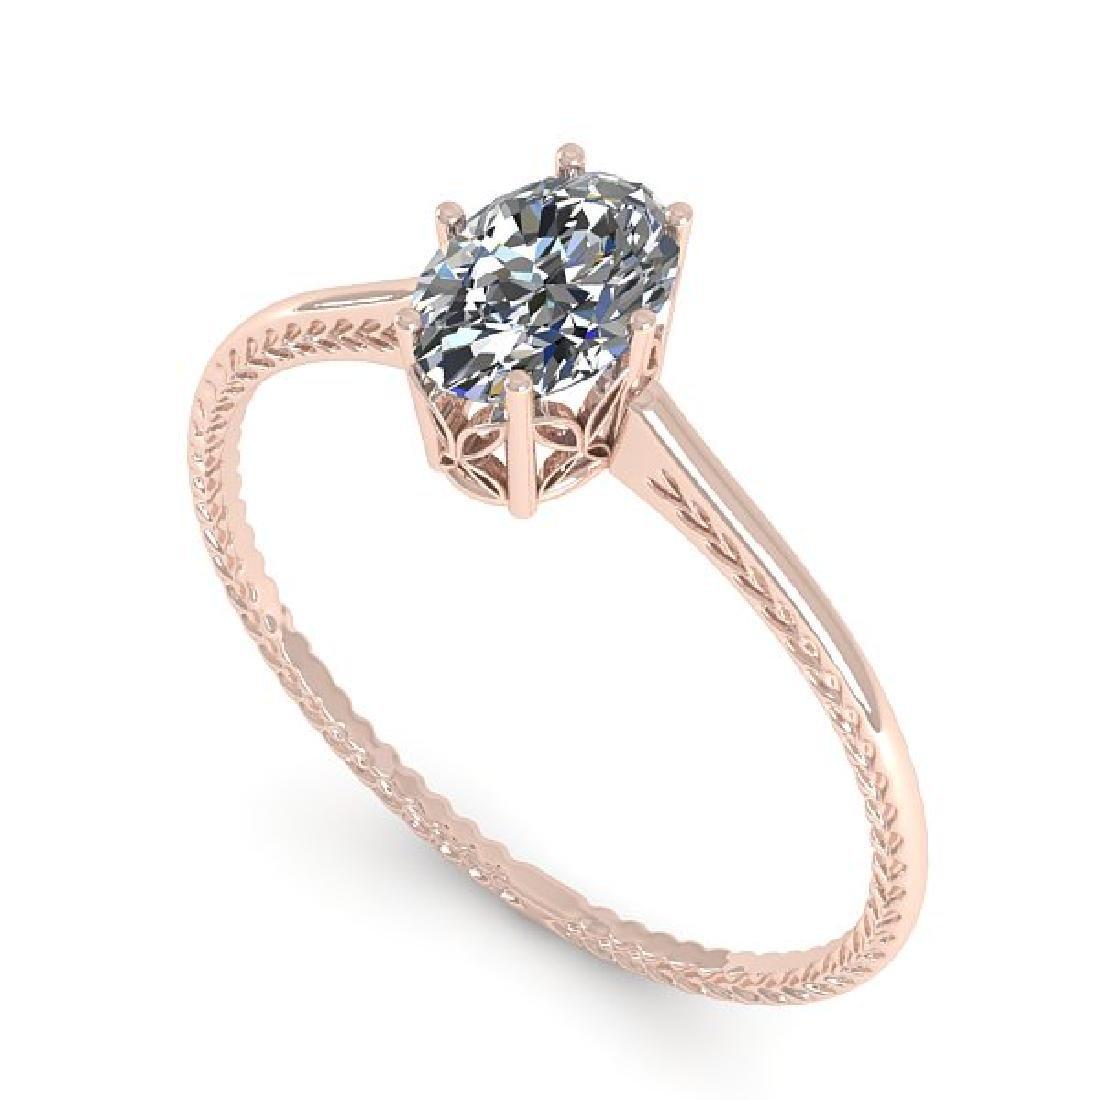 1.0 CTW VS/SI Oval Cut Diamond Art Deco Ring 14K Rose - 2